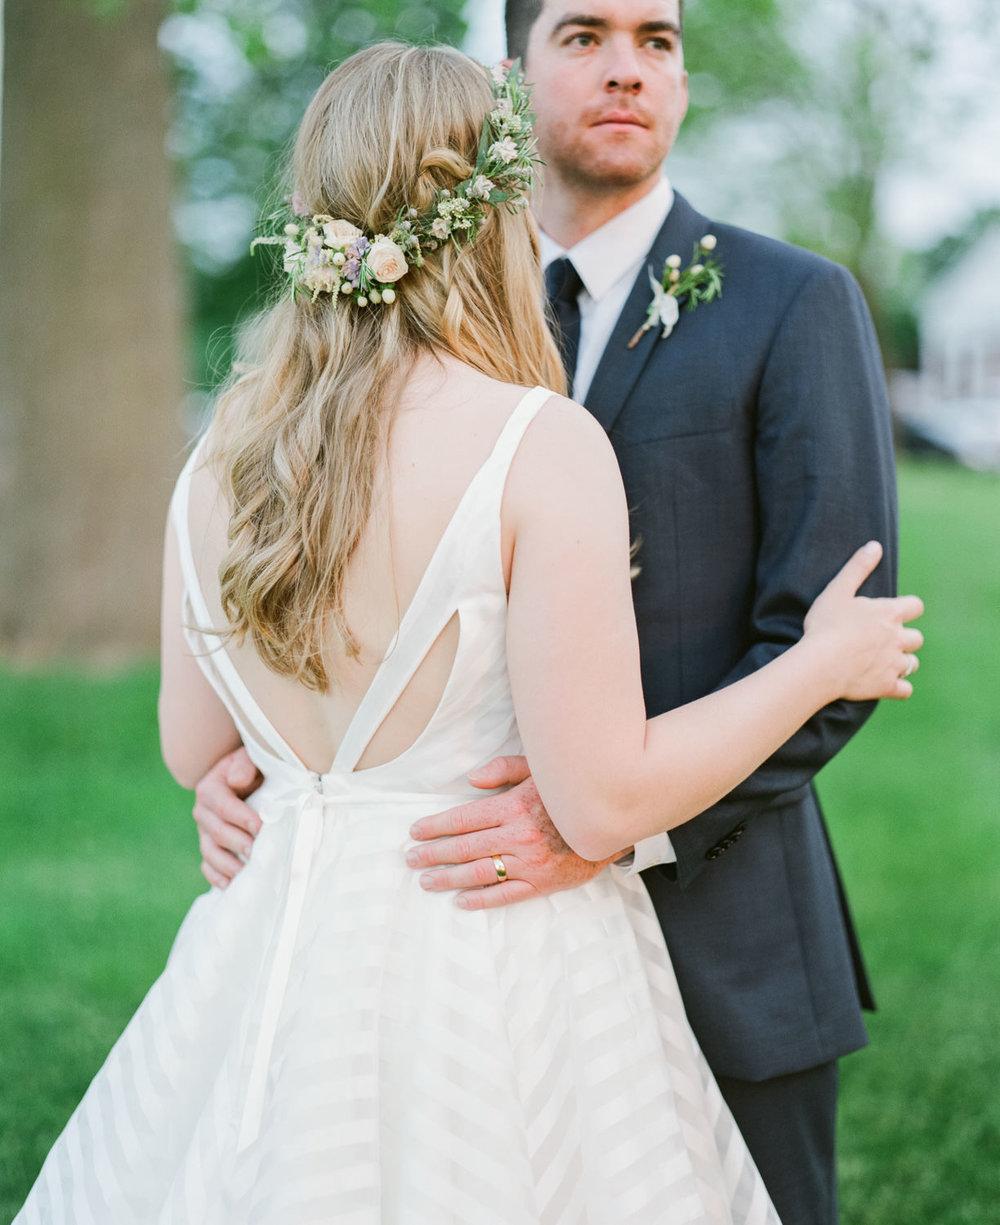 Steeler's Football Player Jordan Berry & Emily Berry Round Barn Wedding-103.jpg